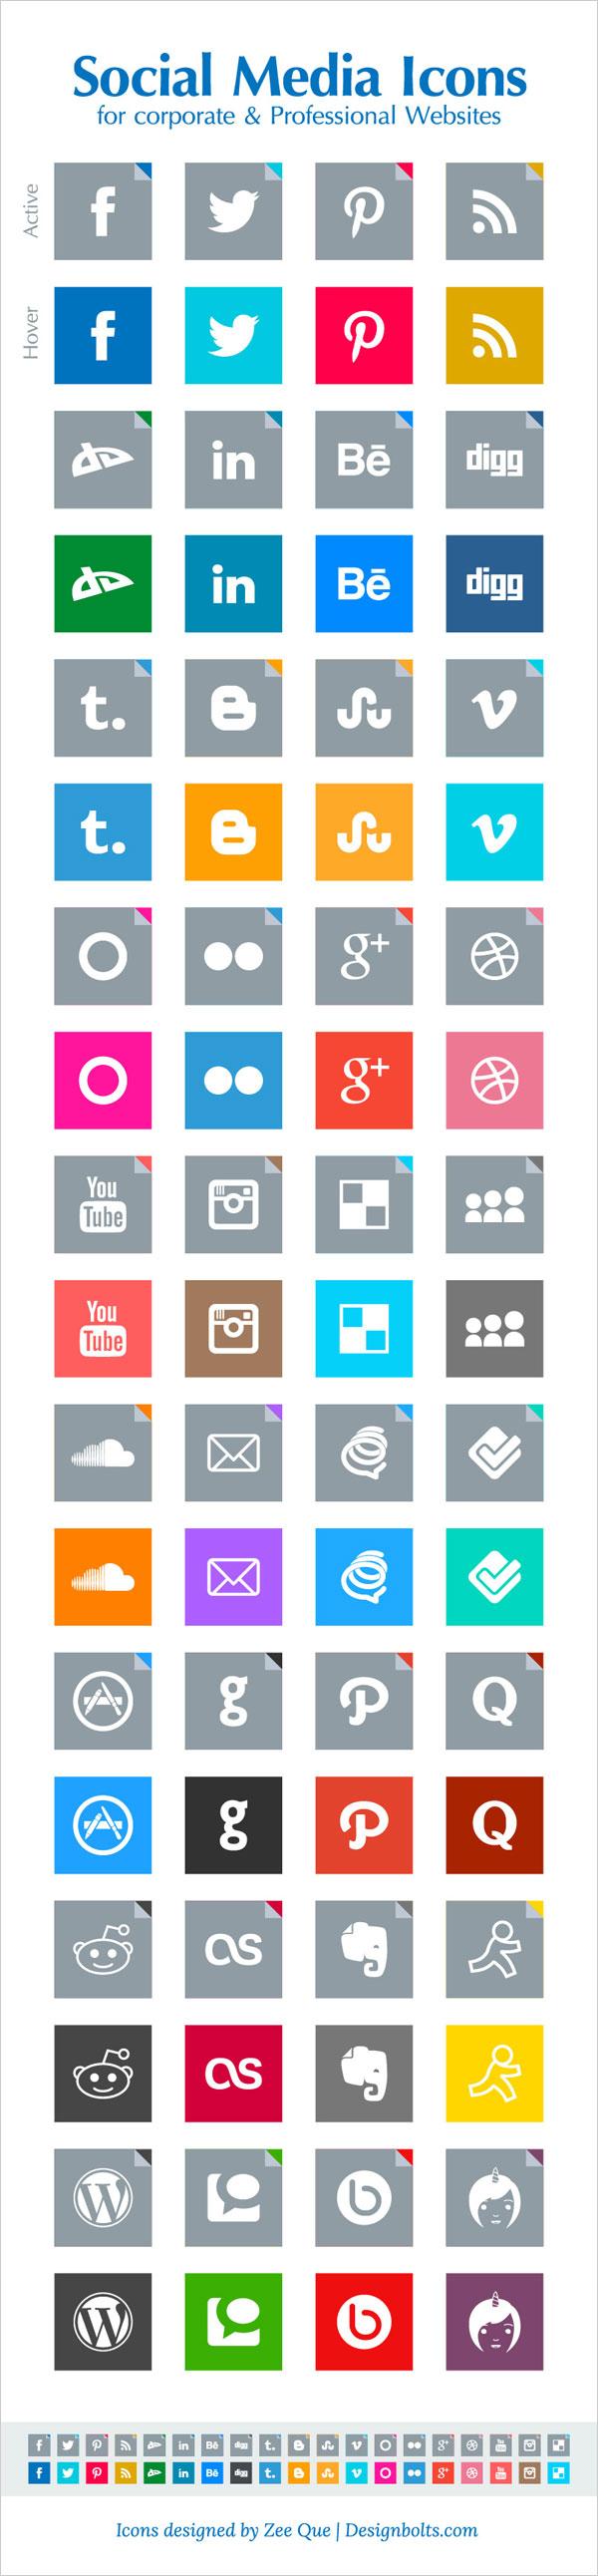 Simple-Social-Media-Icons-2013